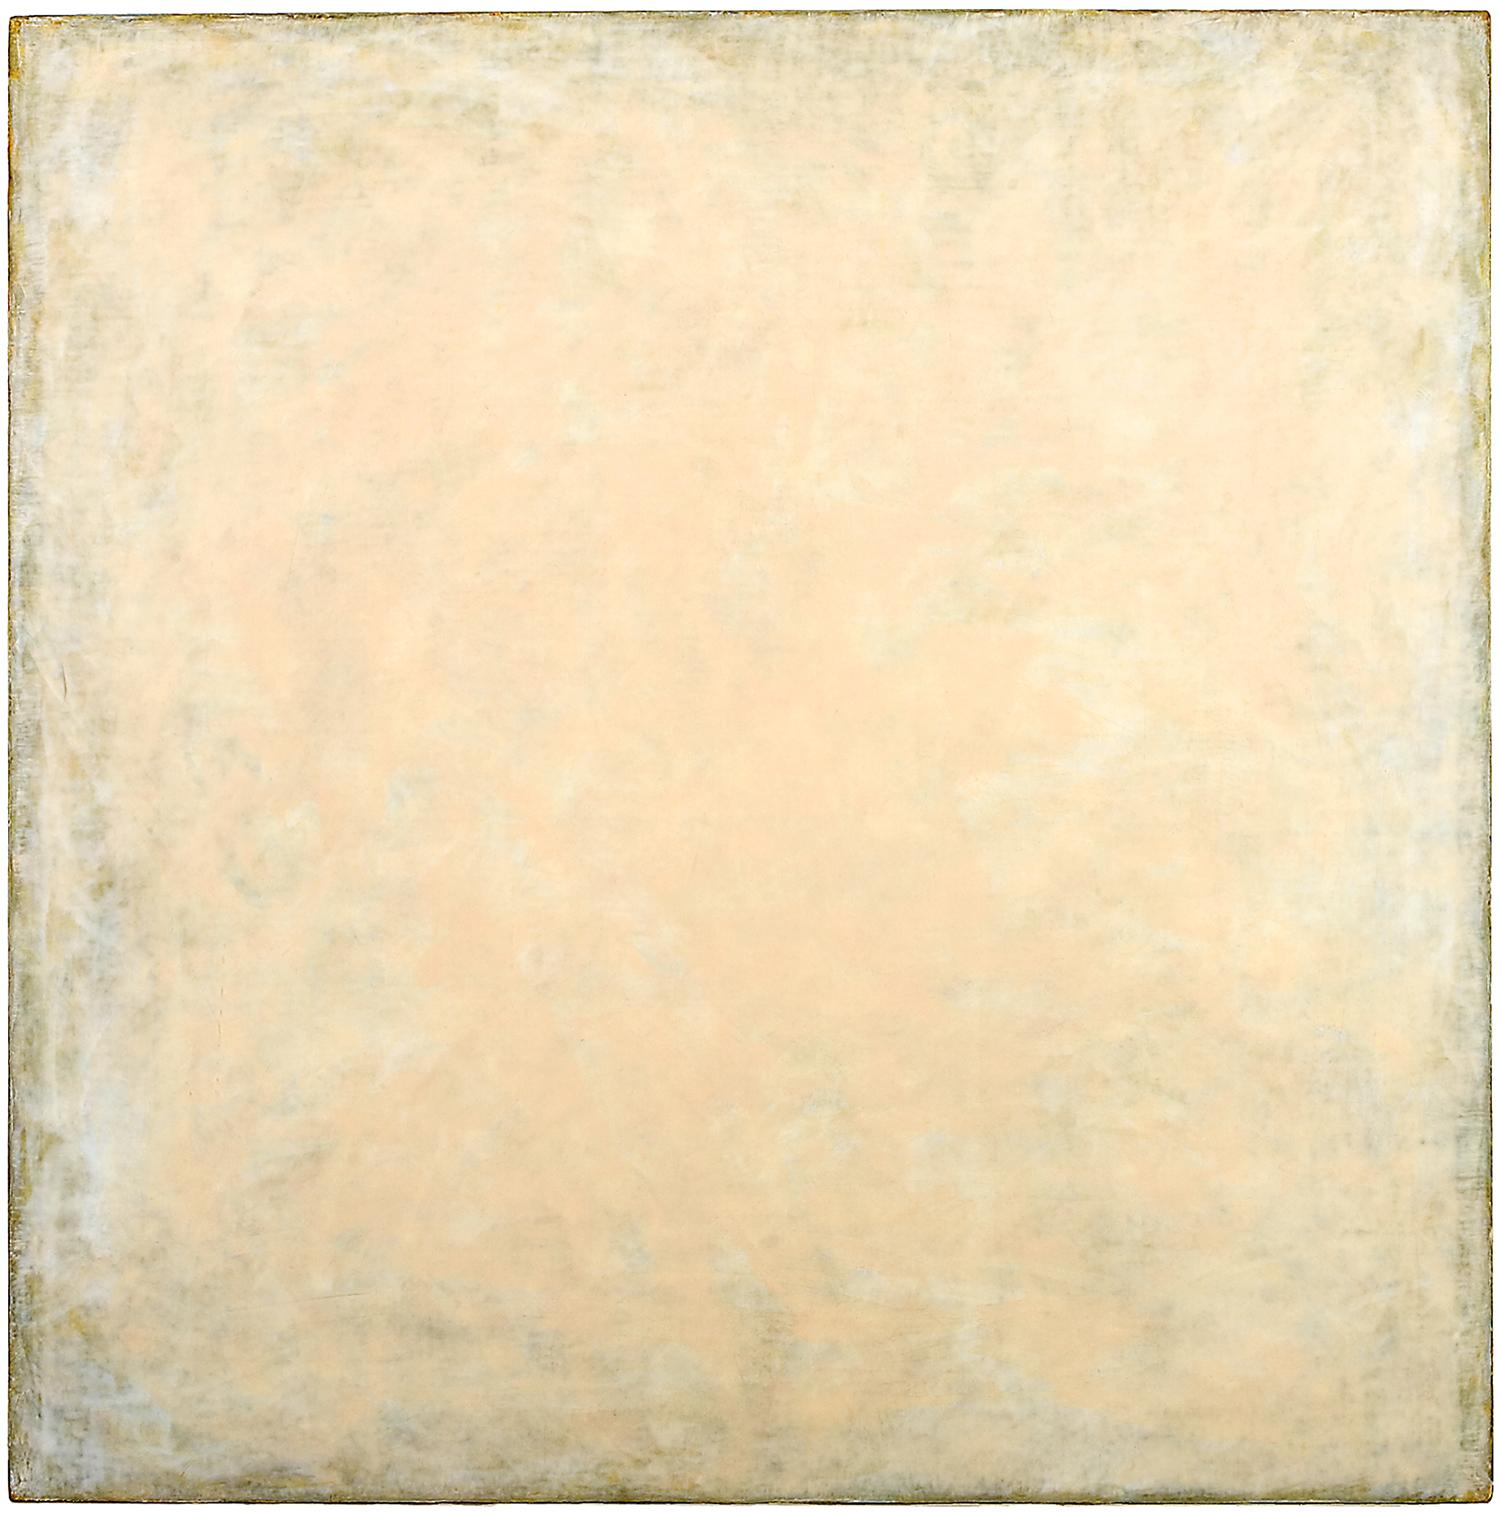 Untitled (field #1), 2004